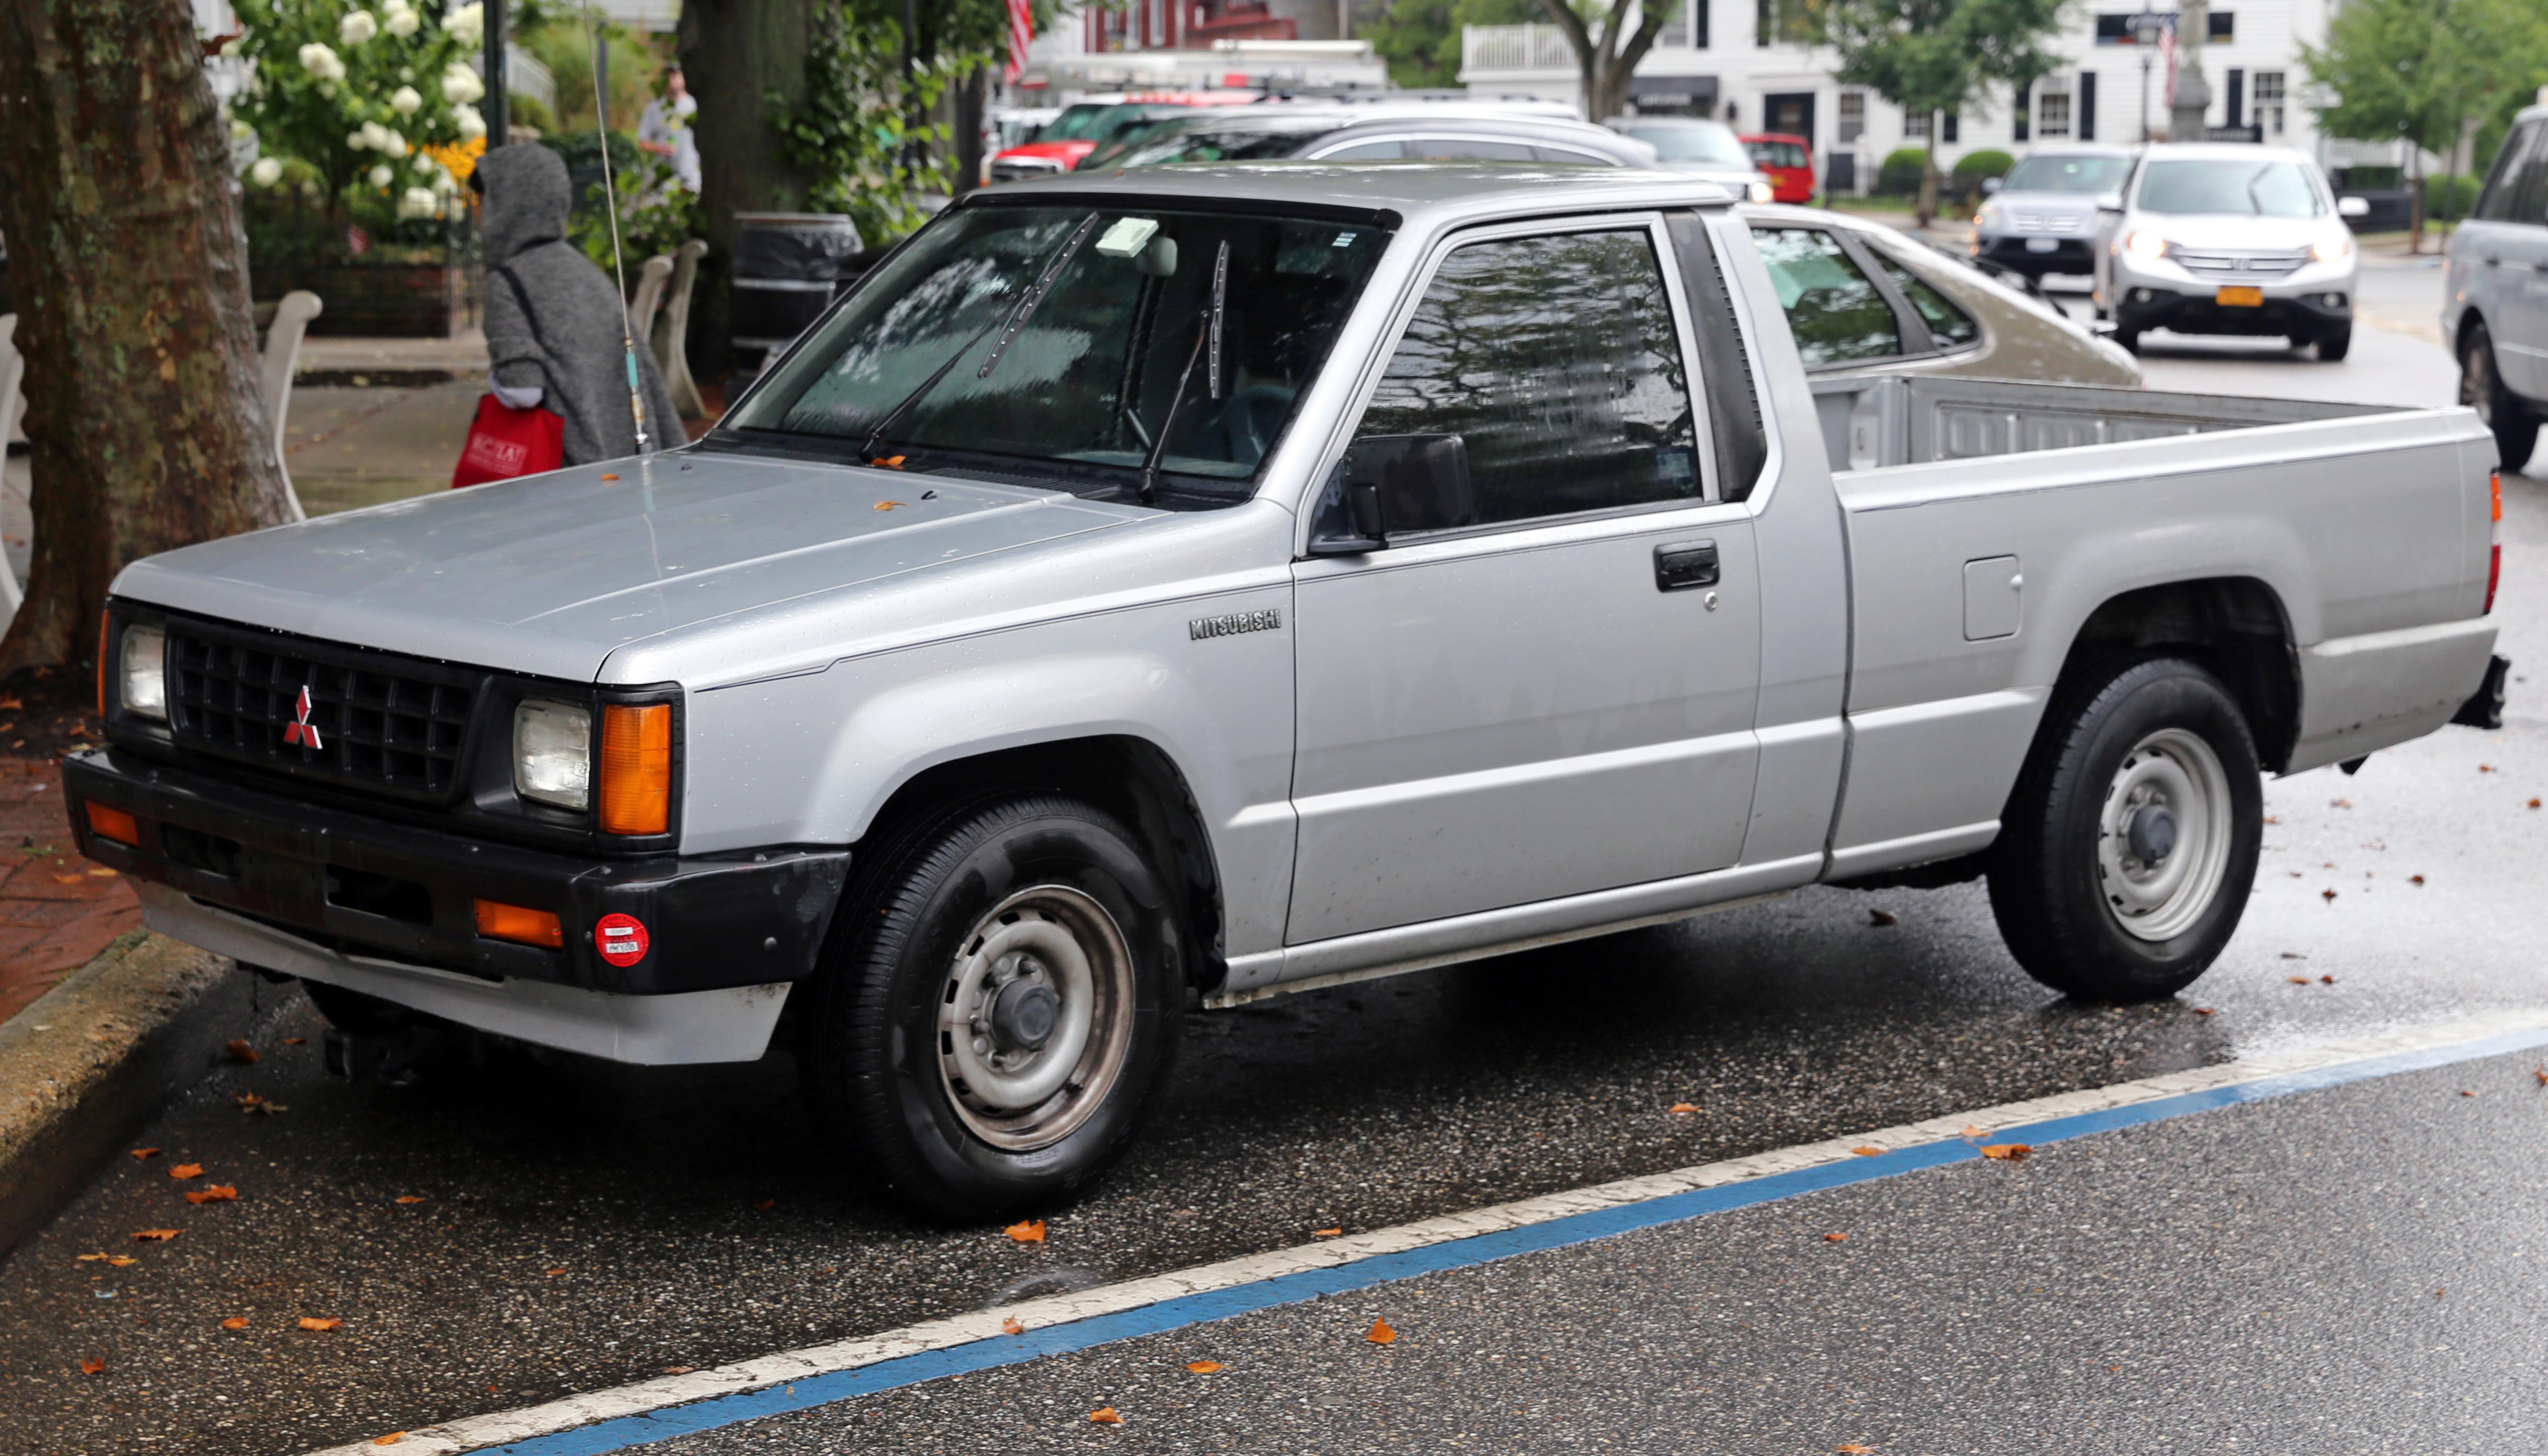 File:1992 Mitsubishi Mighty Max base front.jpg - Wikimedia Commons